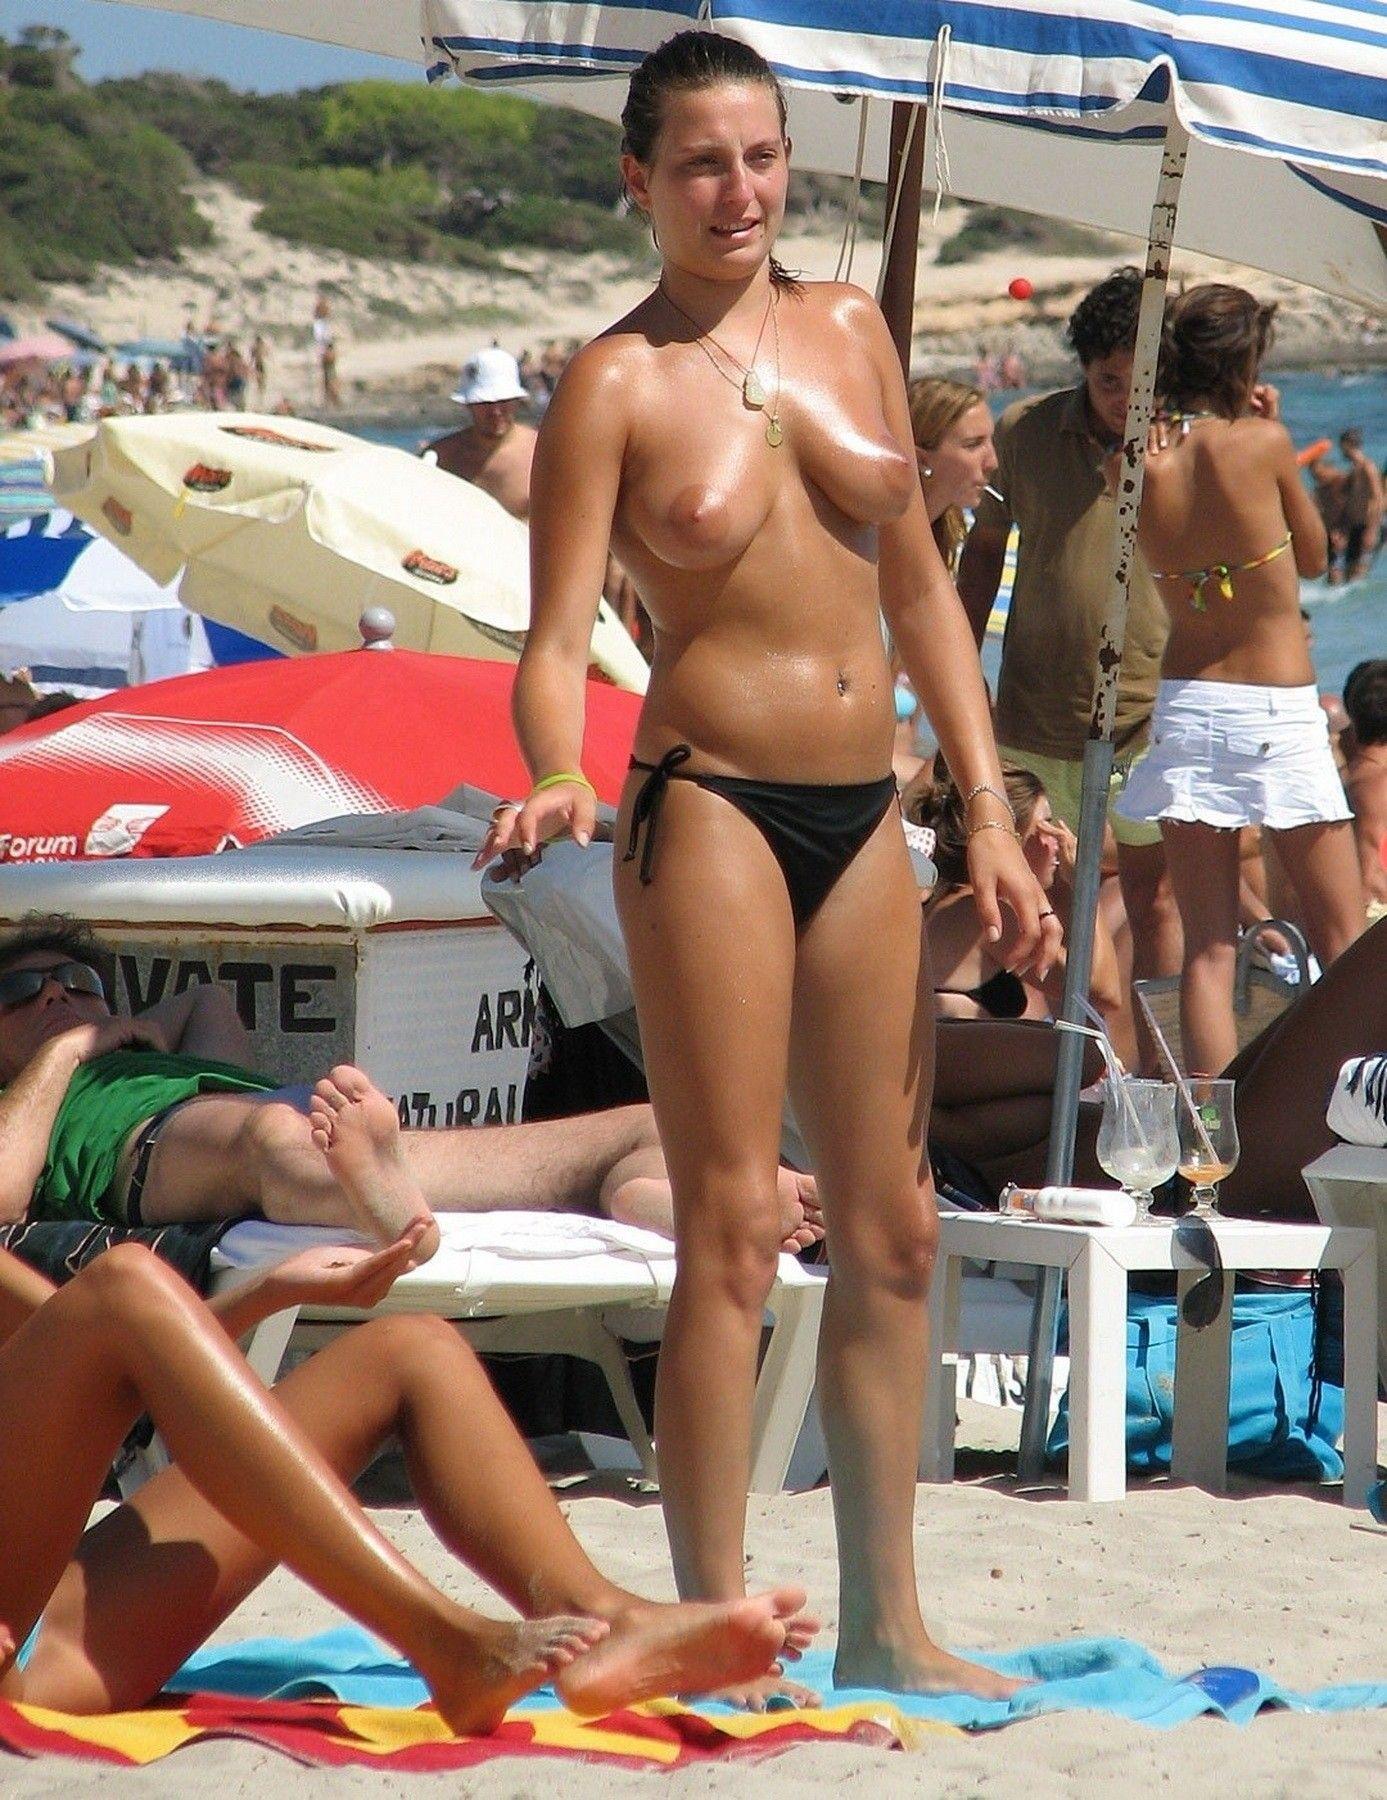 Please Feel Free To Submit Flashing Pics Preferable Something Tasteful Gunnison Beach